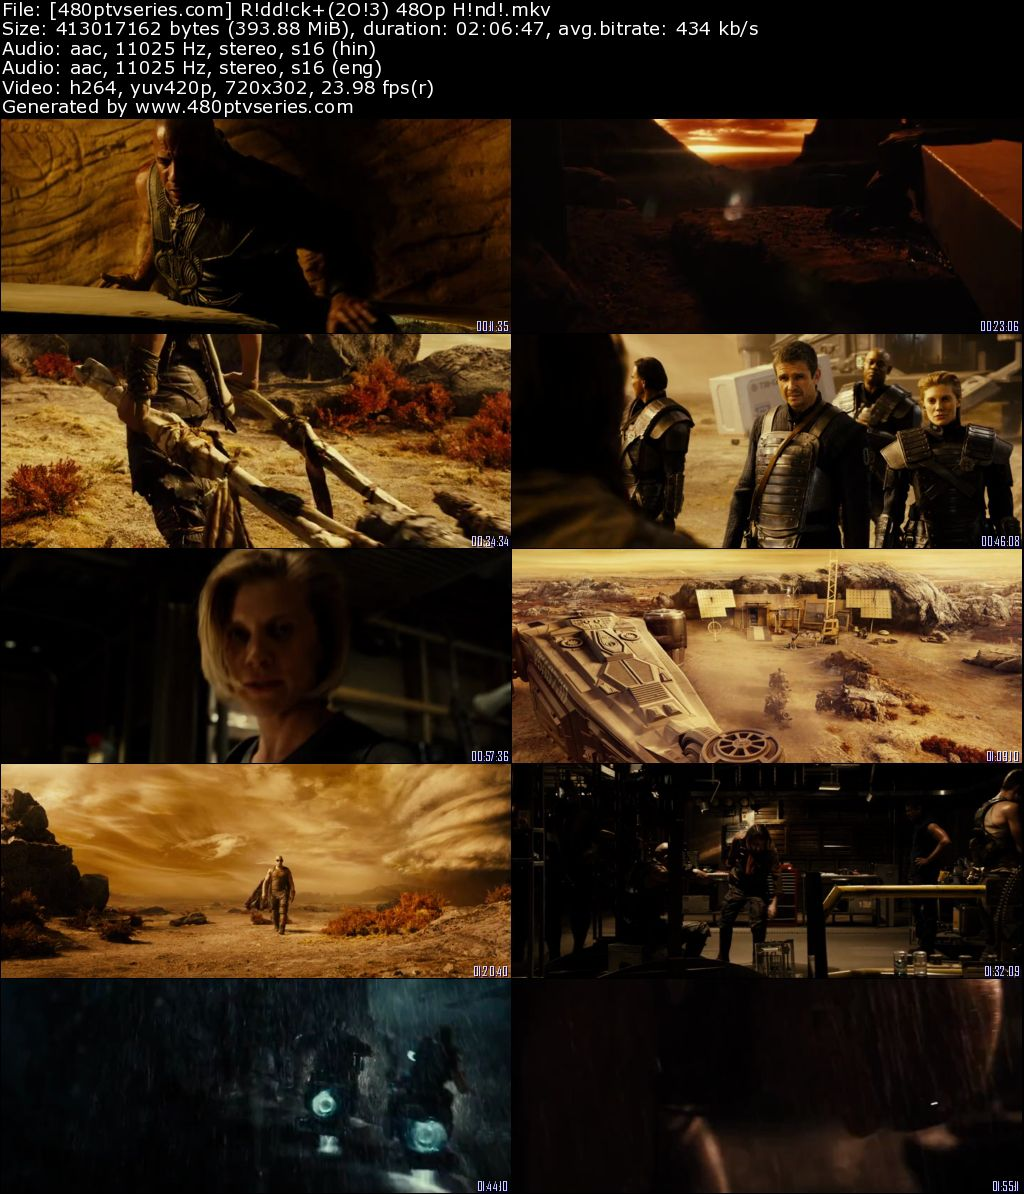 Riddick (2013) 350MB Full Hindi Dual Audio Movie Download 480p Bluray Free Watch Online Full Movie Download Worldfree4u 9xmovies